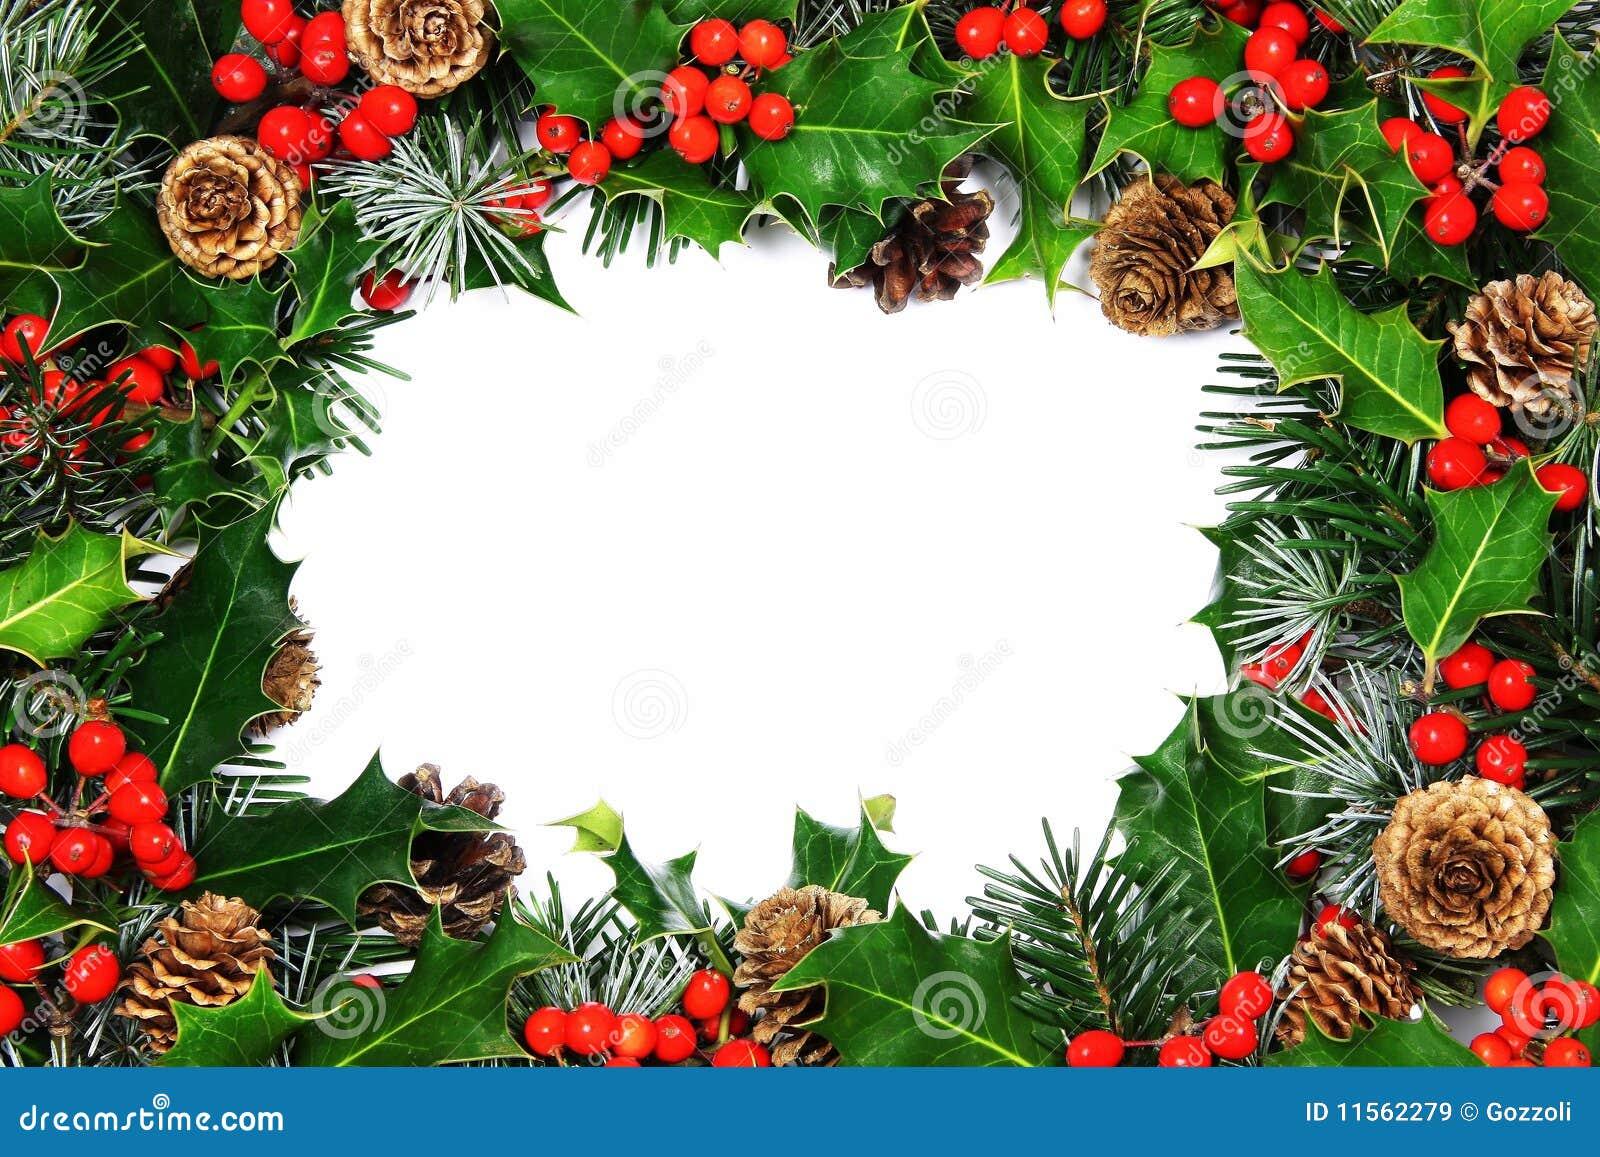 Christmas holly border stock image of pine cypress